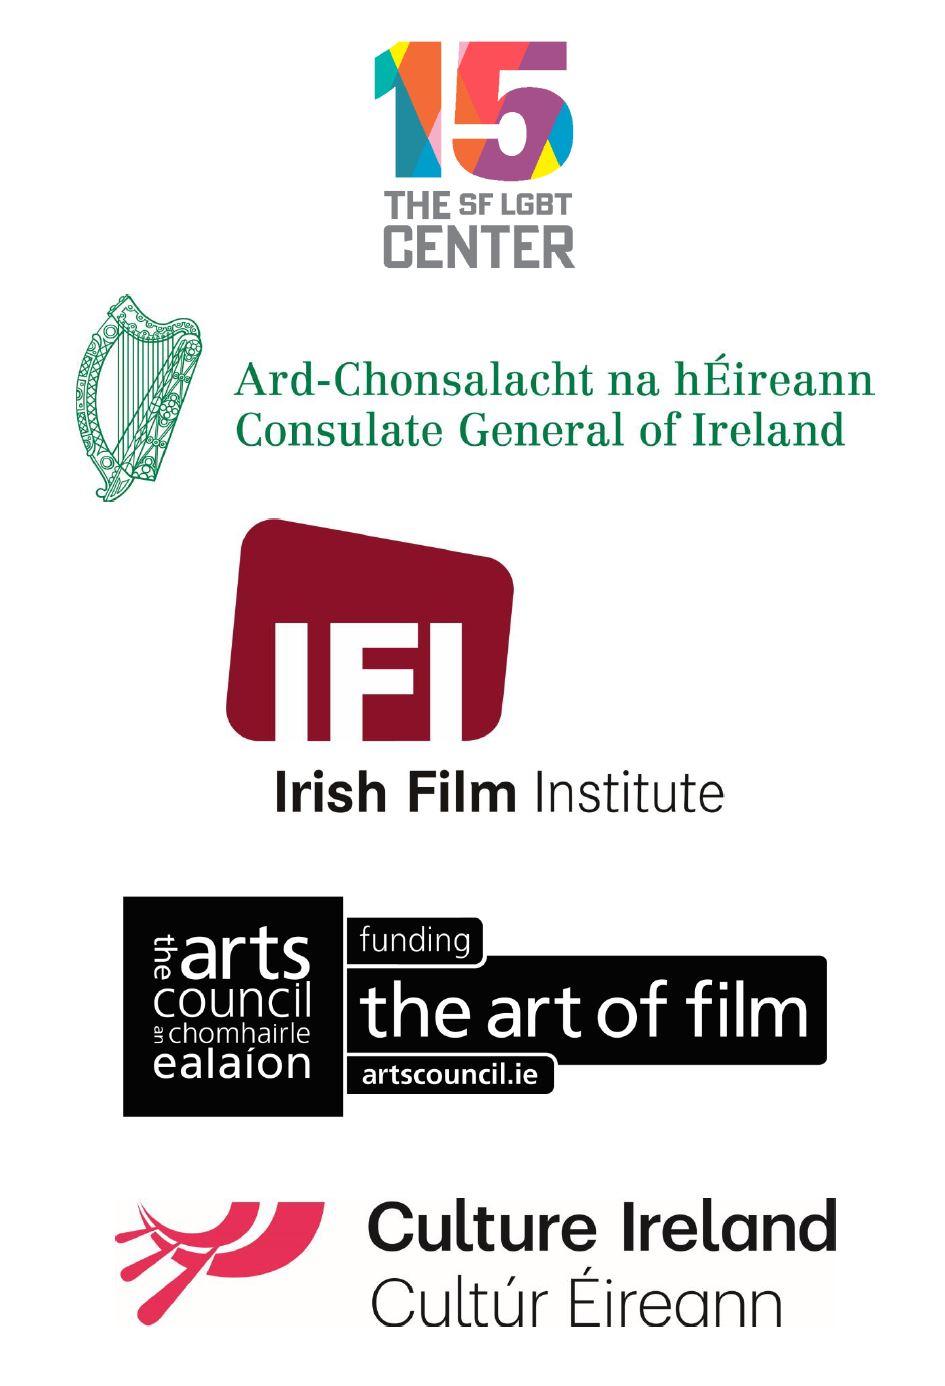 Sponsor logos: SF LGBT Center, Consulate General of Ireland